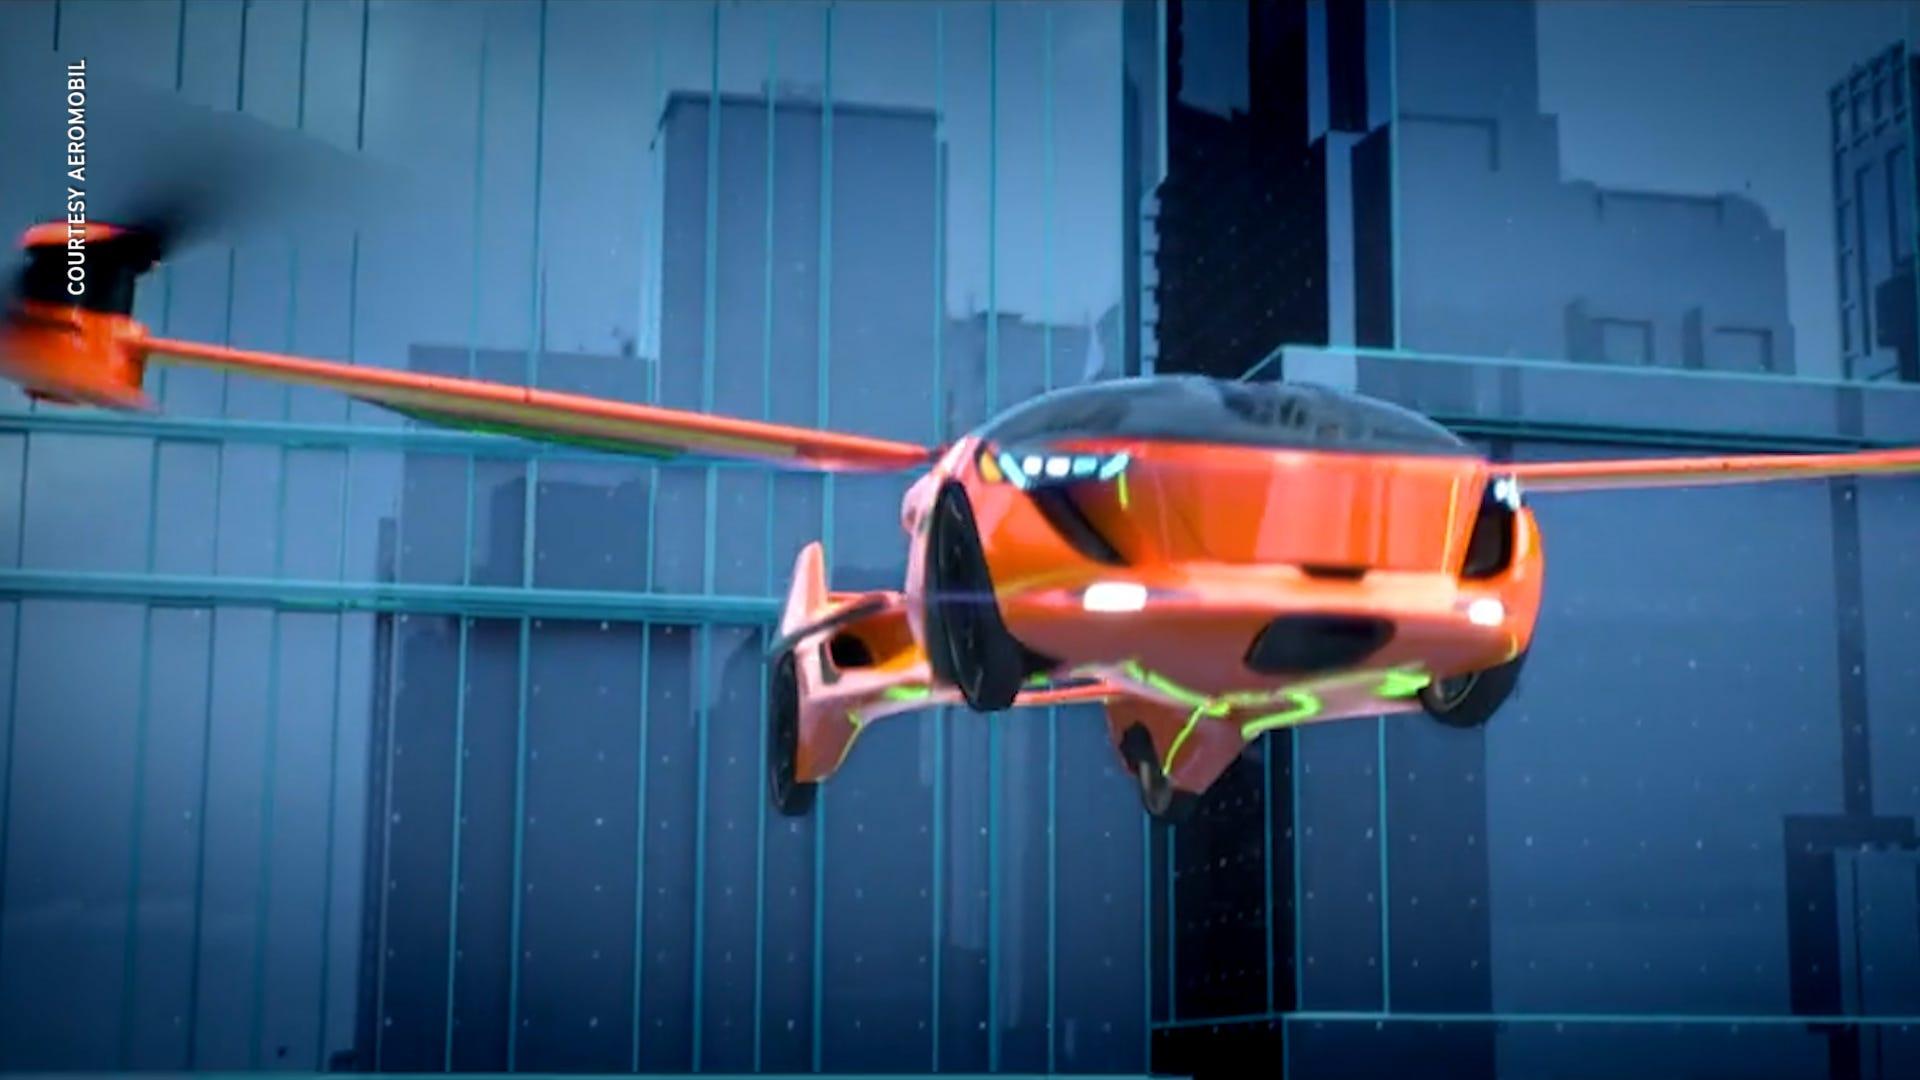 Flying car fantasy may finally be on the horizon